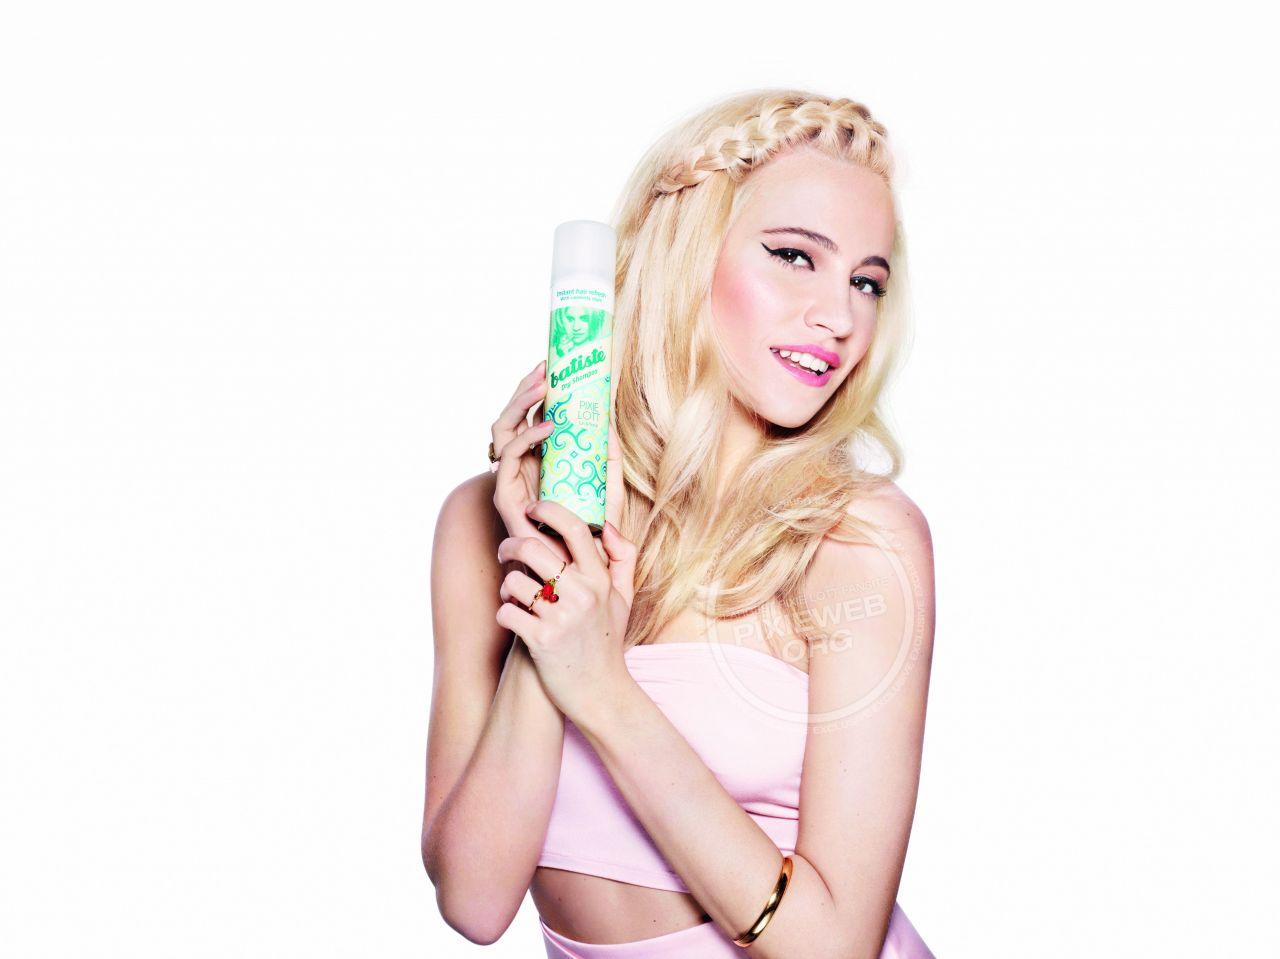 pixie-lott-rankin-photoshoot-for-batiste-dry-shampoo-ads_3